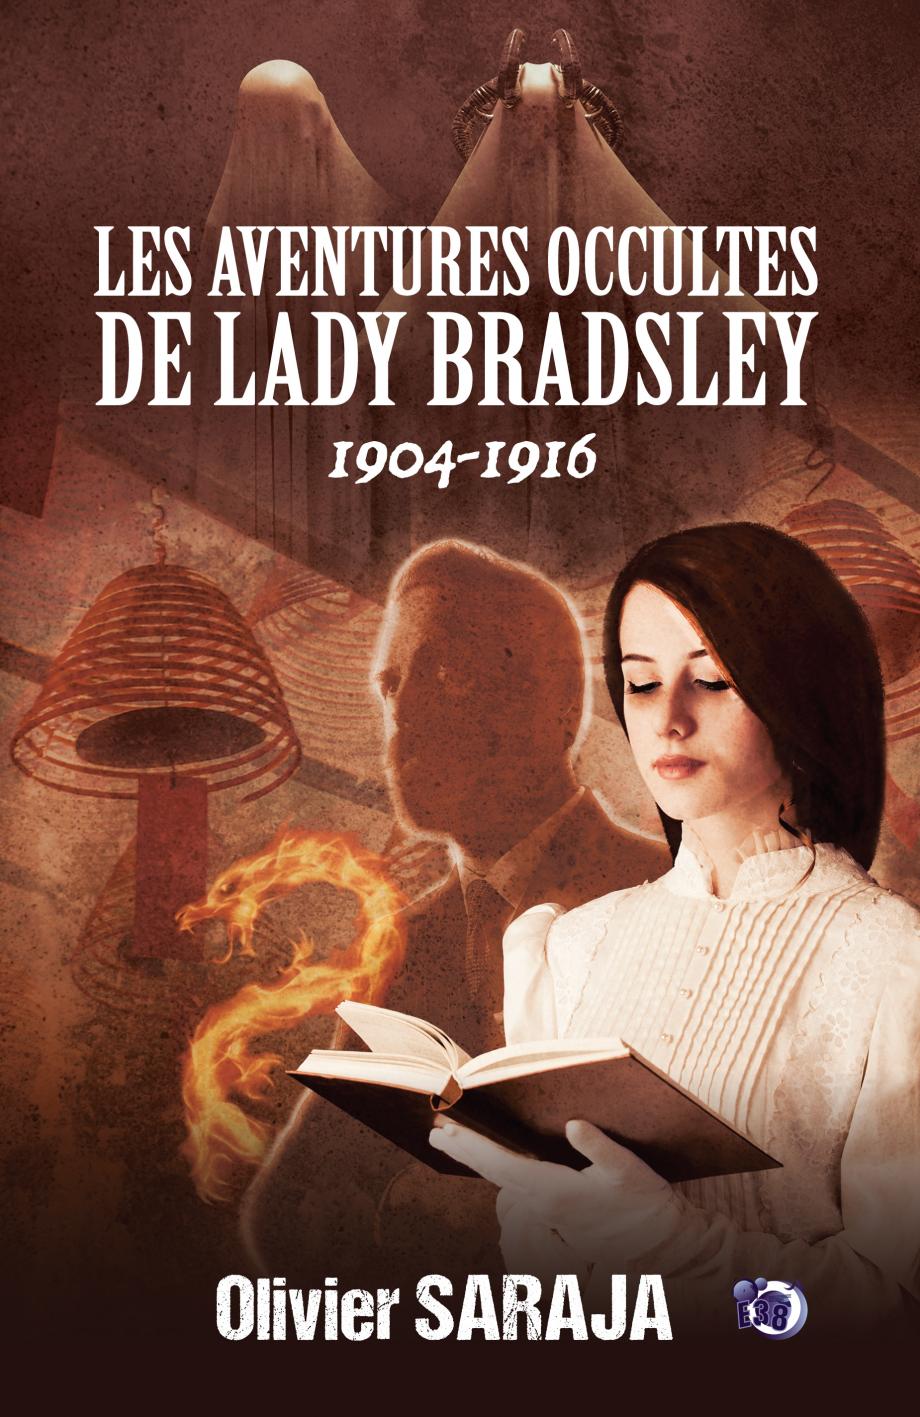 « Les Aventures occultes de Lady Bradsley », d'Olivier Saraja